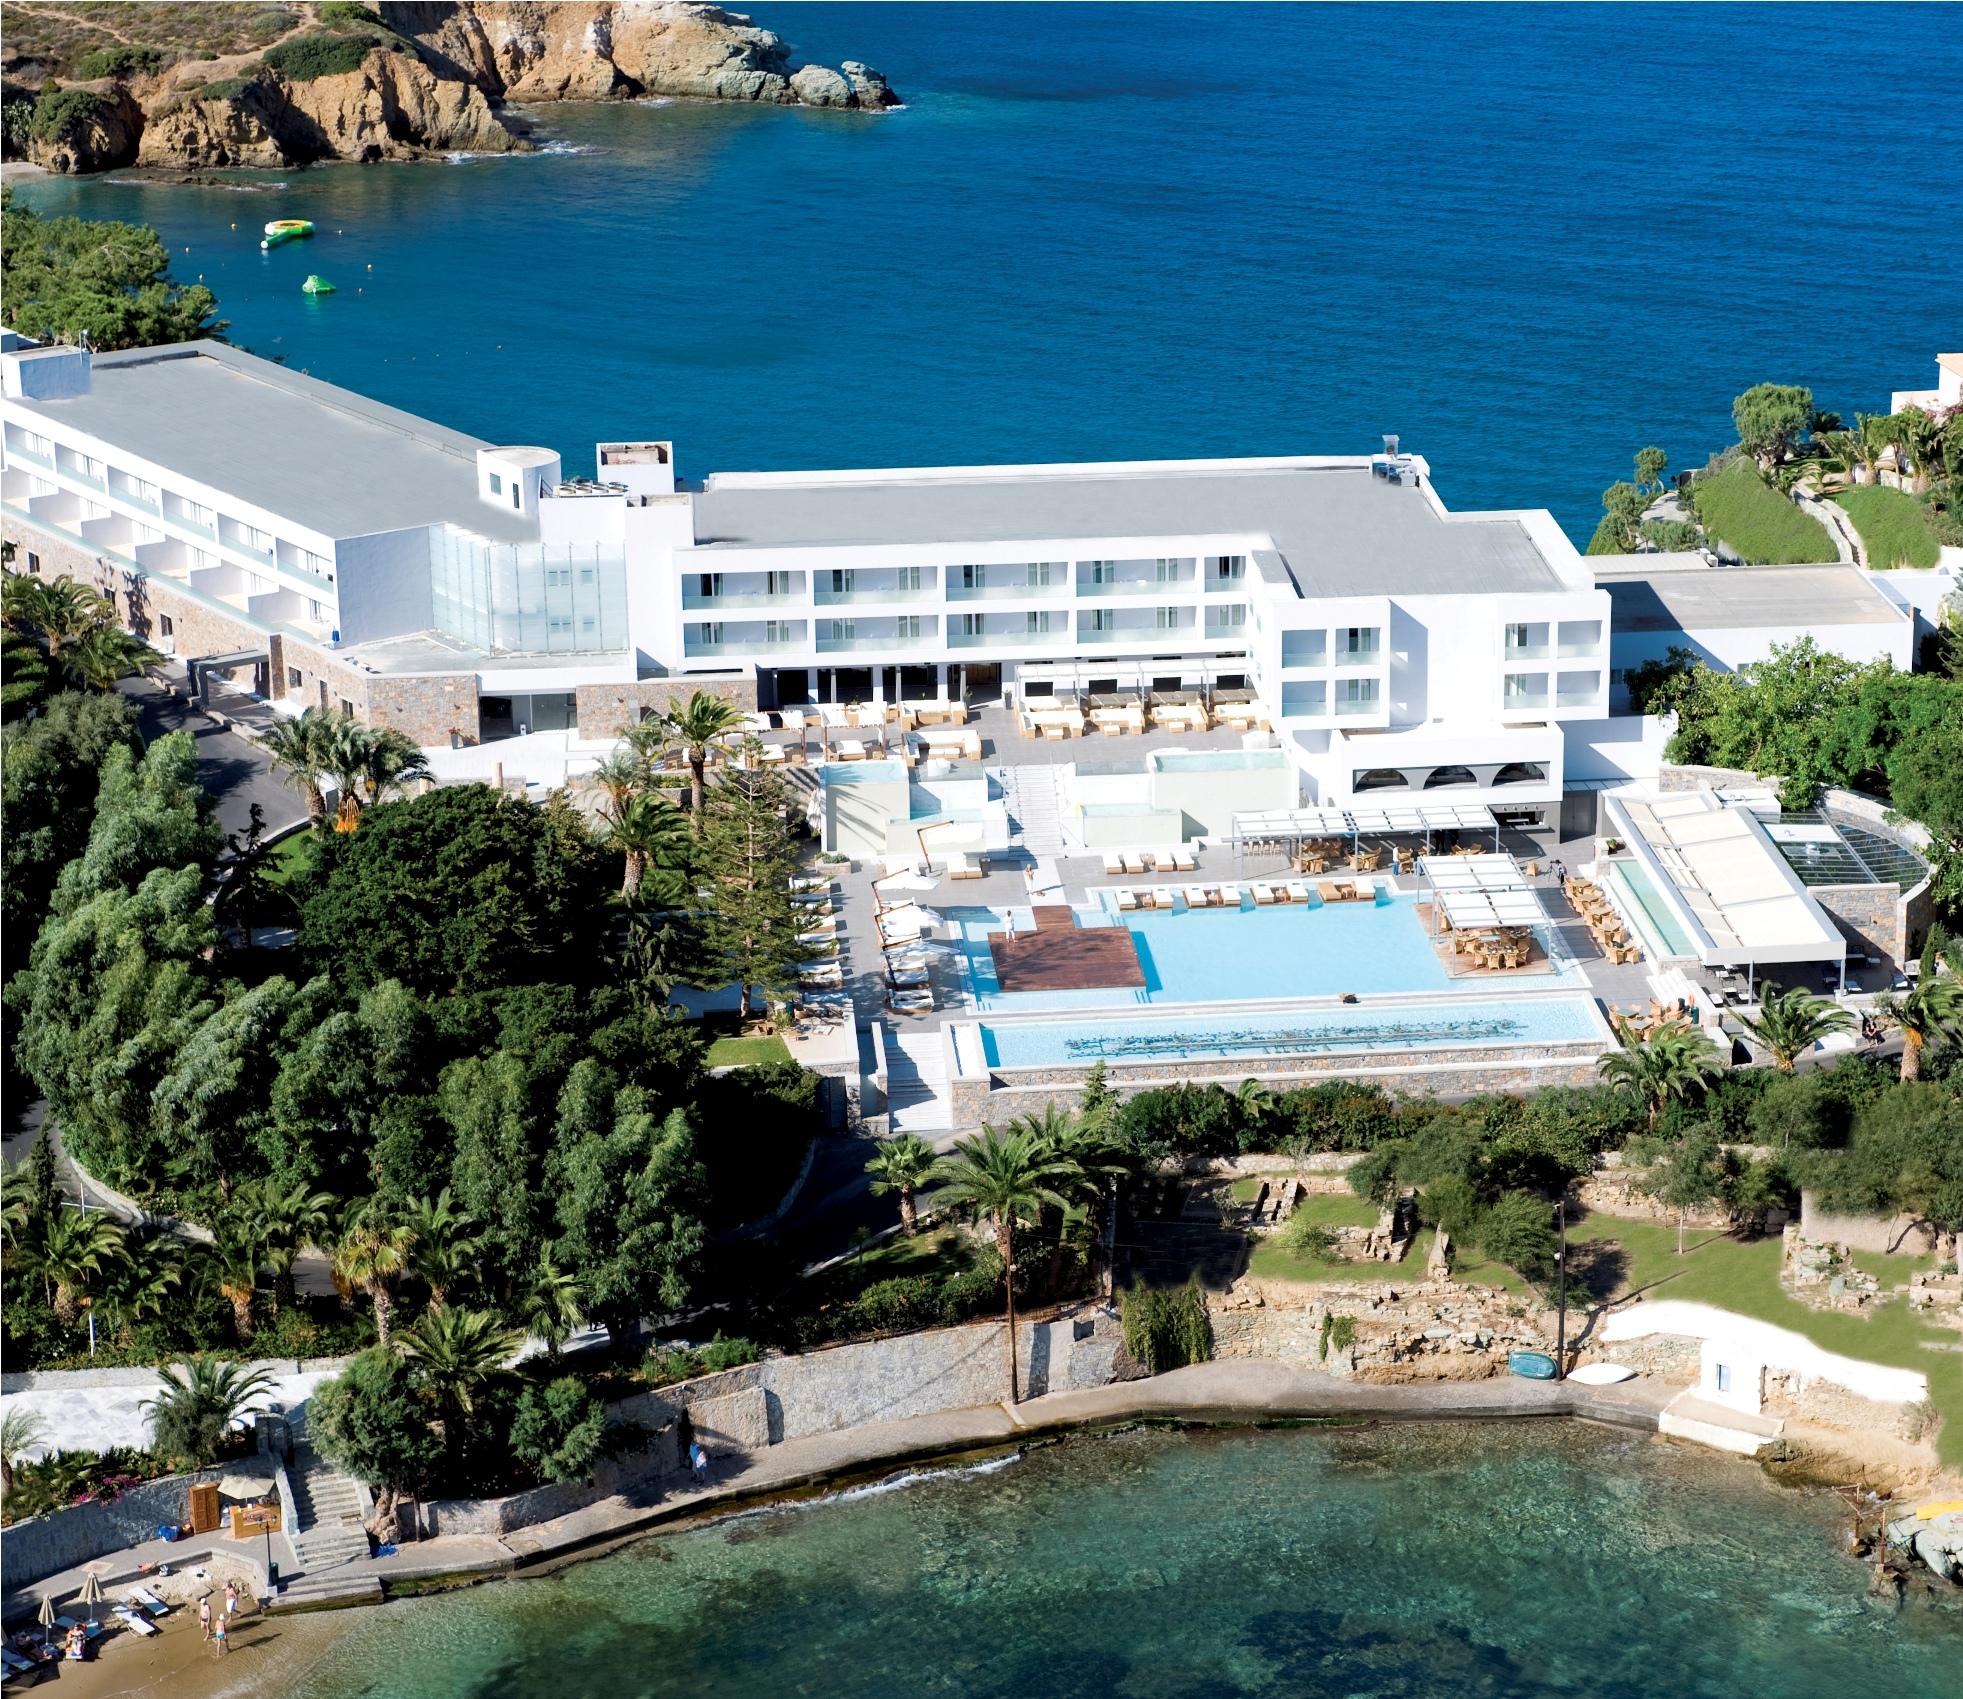 Capsis Crystal Energy Hotel 5* (Агия Пелагия, Крит, Греция